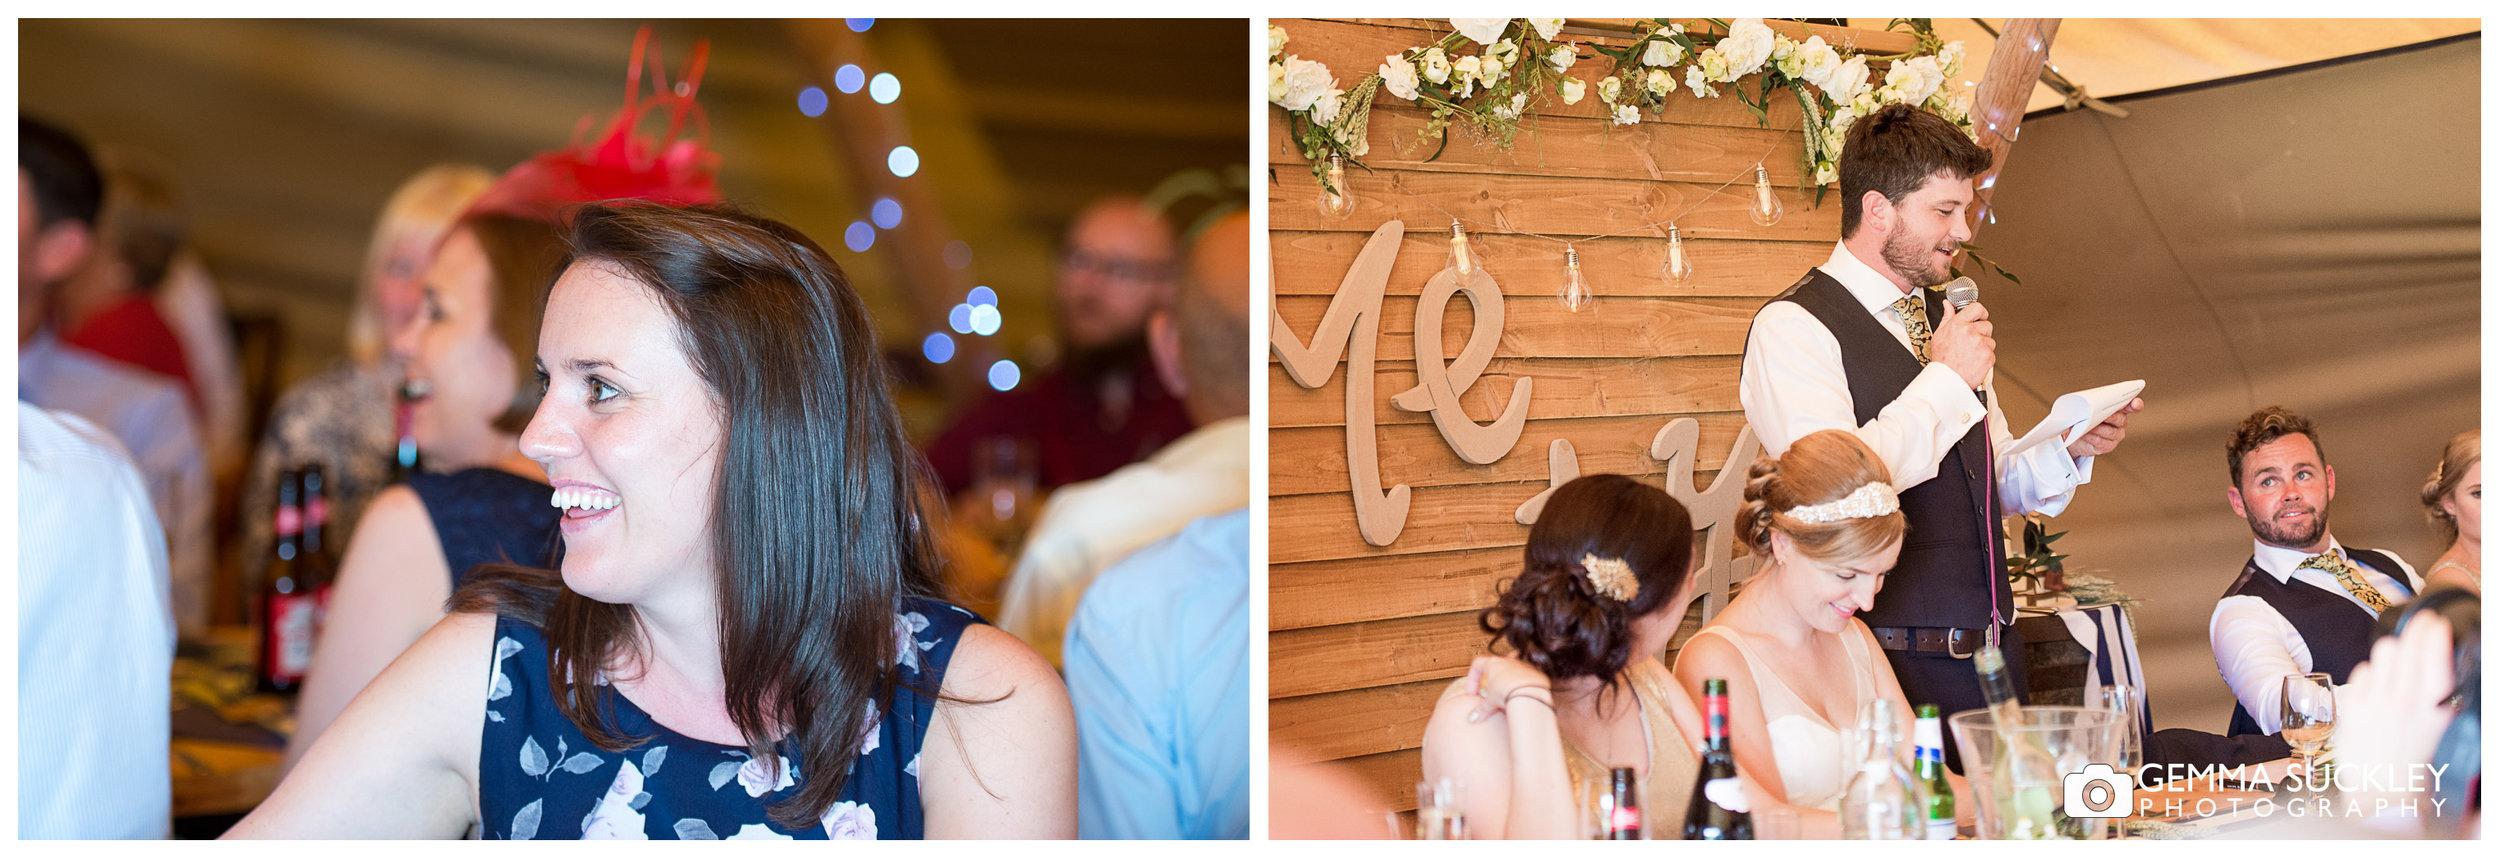 wedding speeches at oaklands in Est Yorkshire